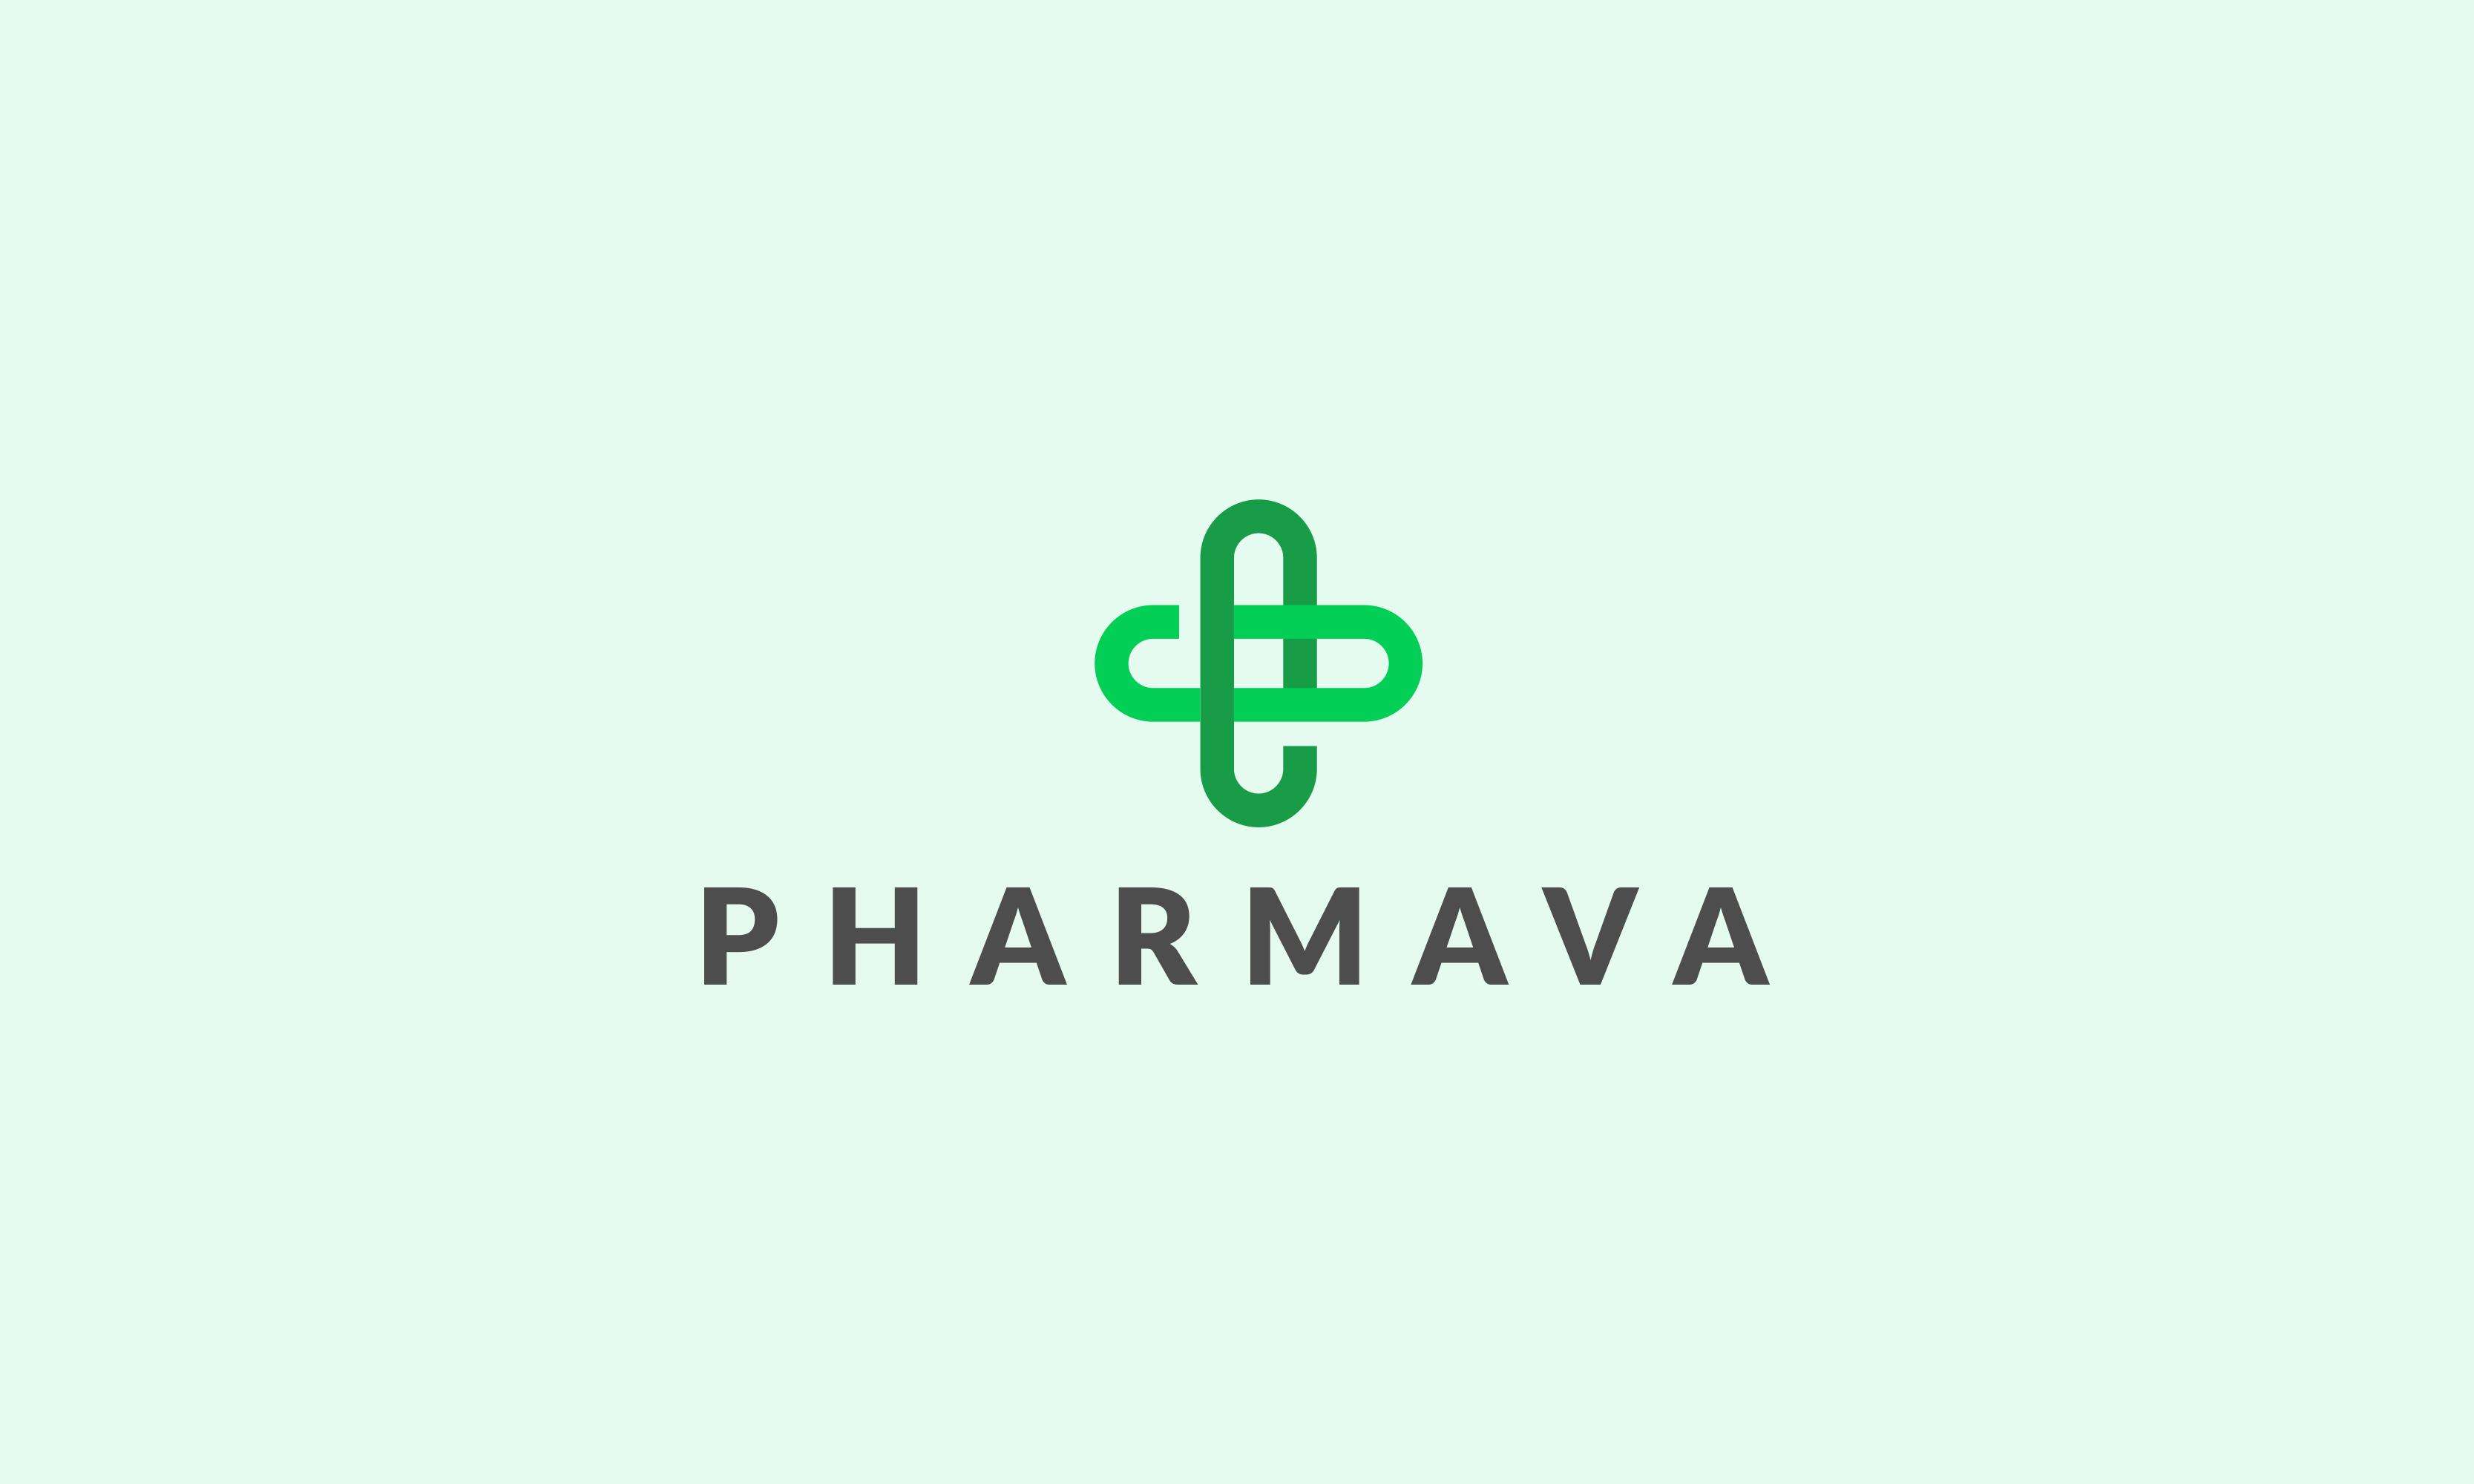 Pharmava